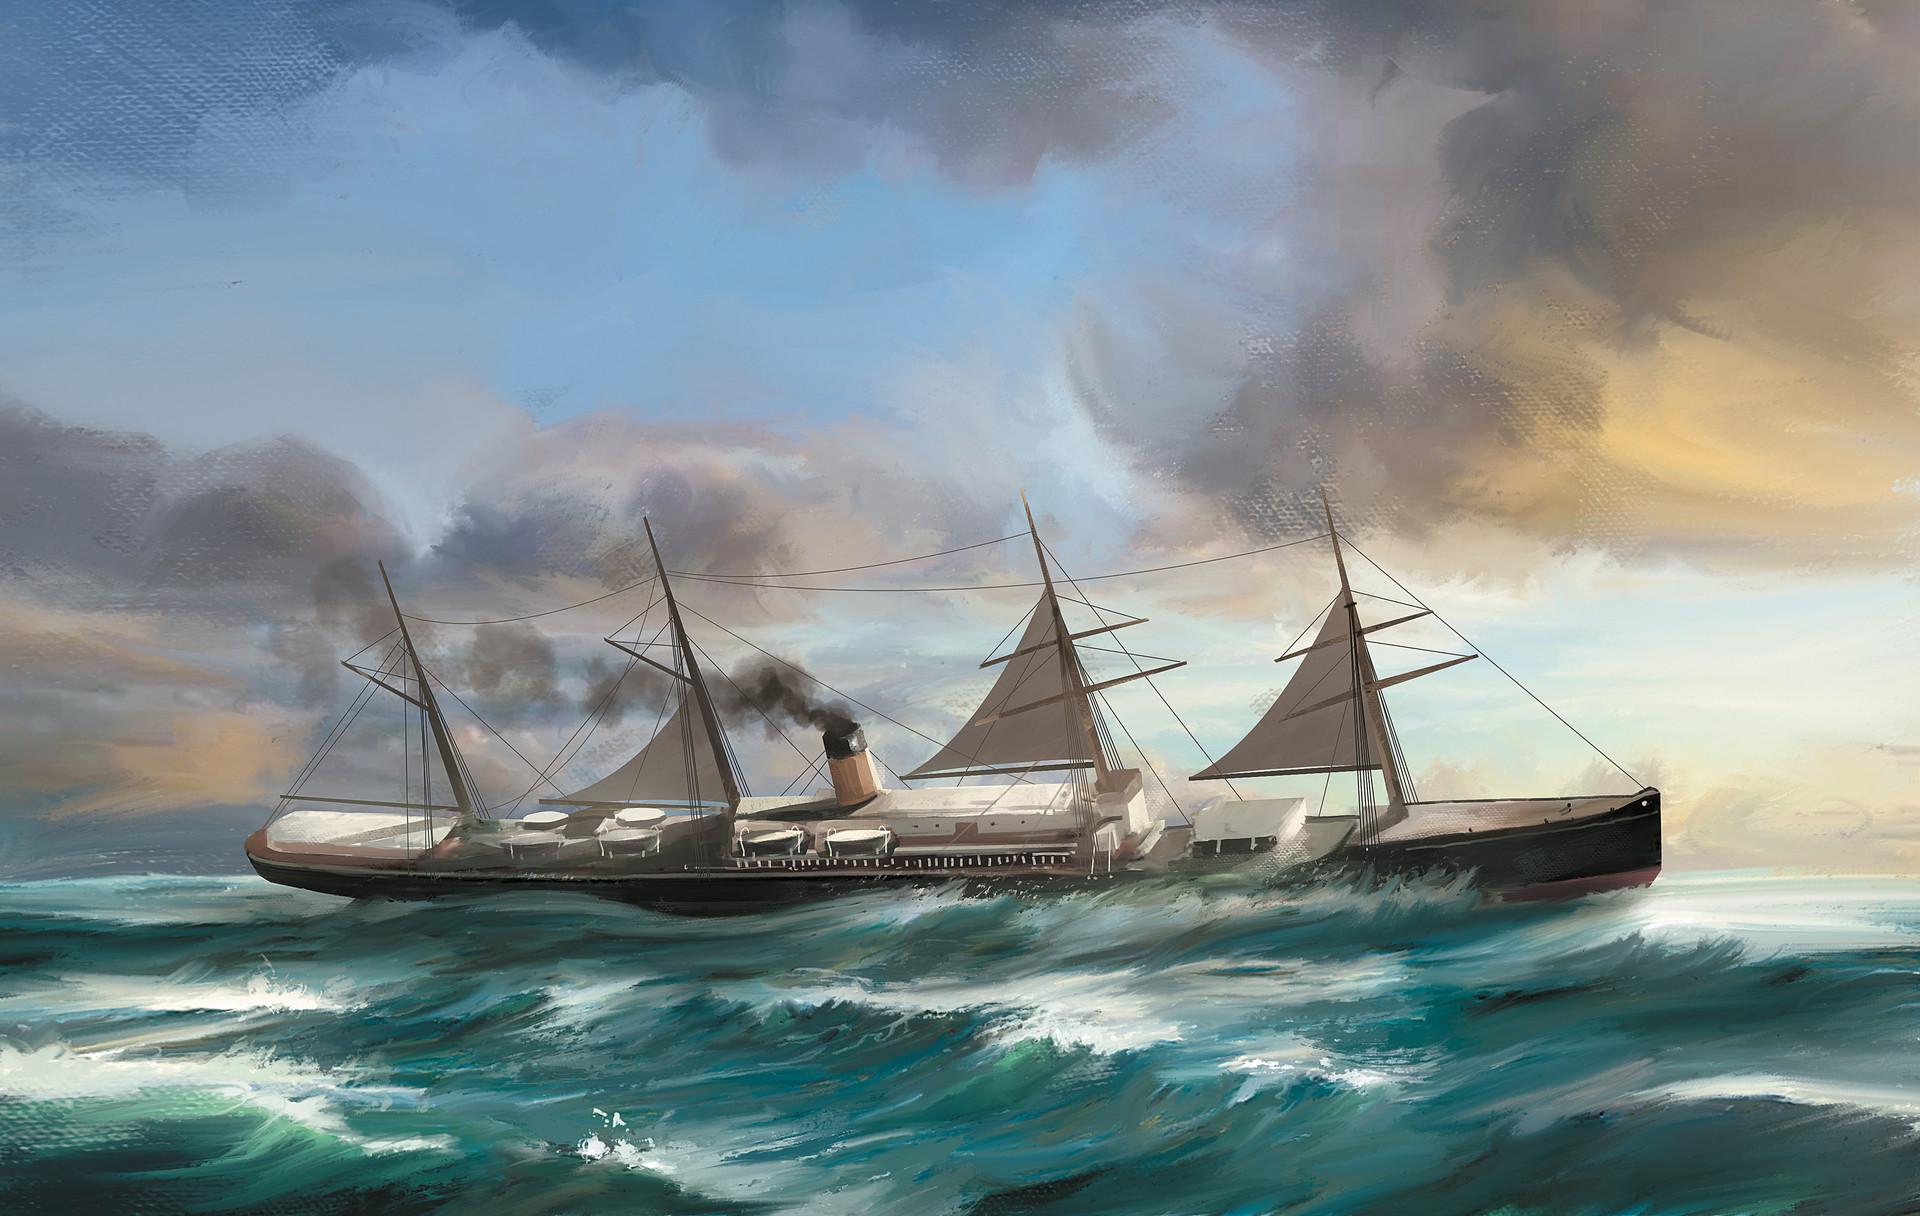 Dominik mayer 1872 adriatic 03